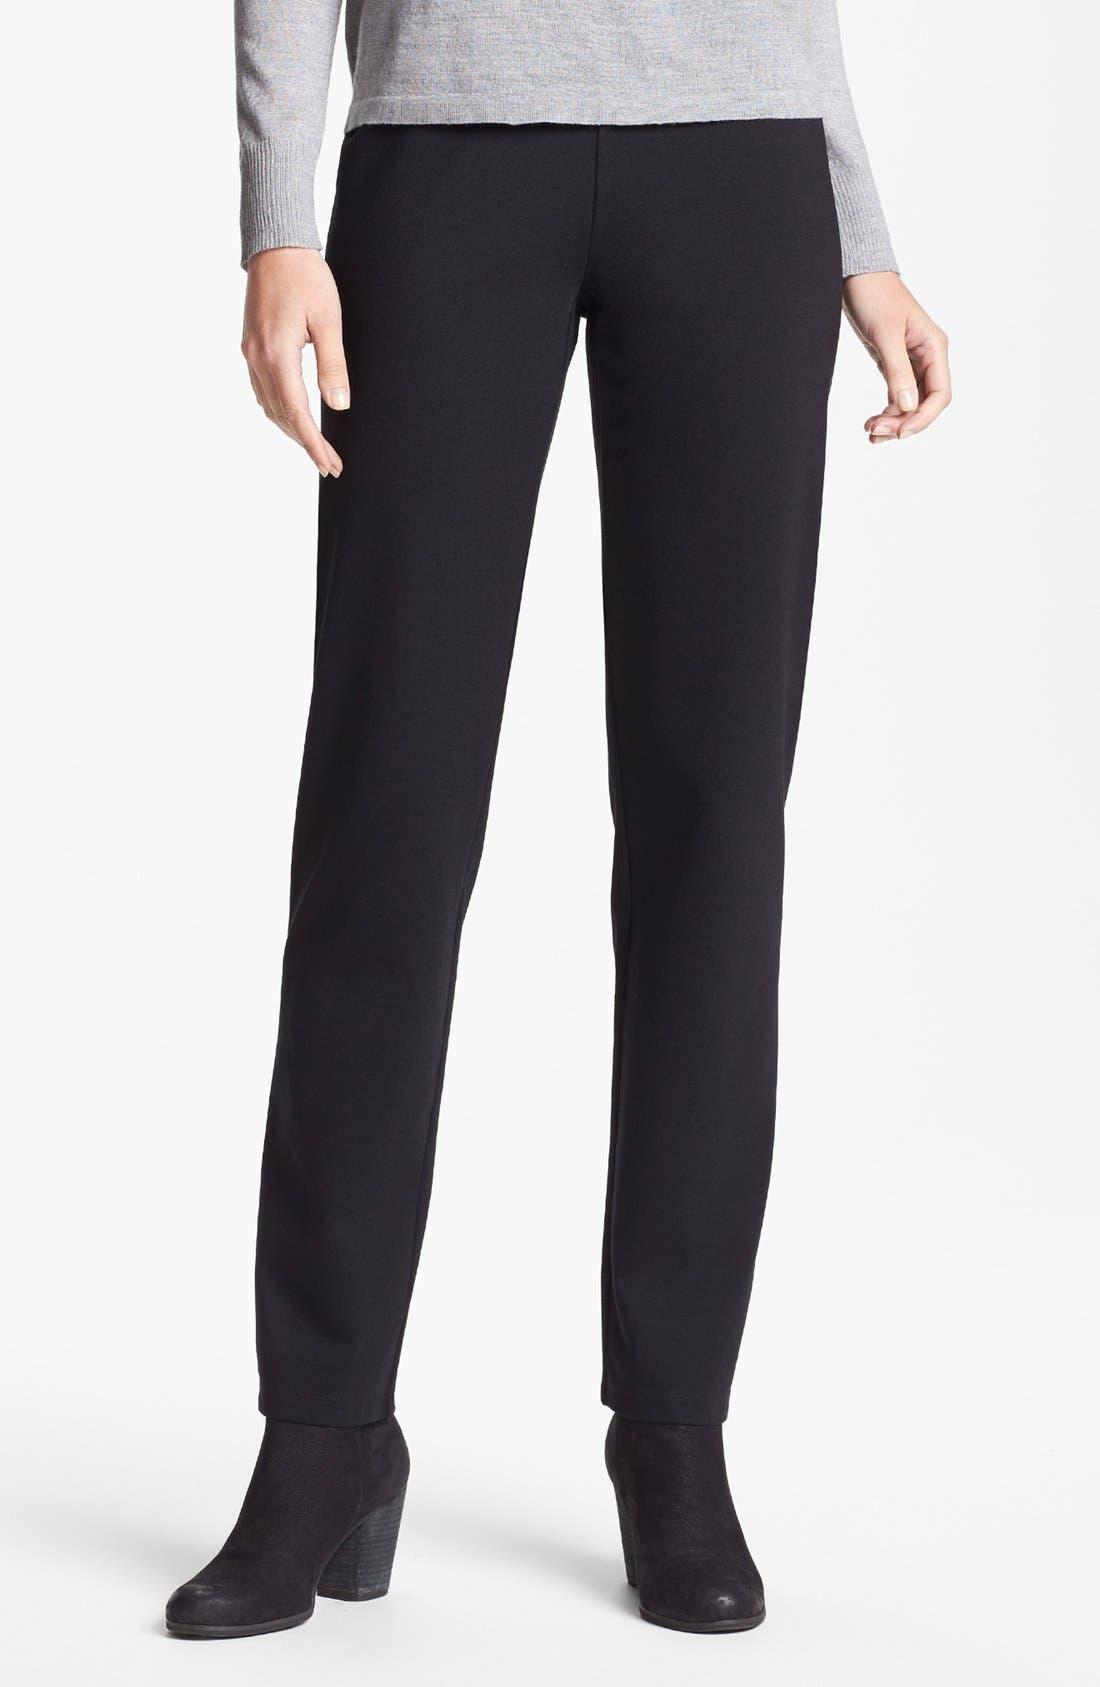 Main Image - Eileen Fisher Slim Pull-On Pants